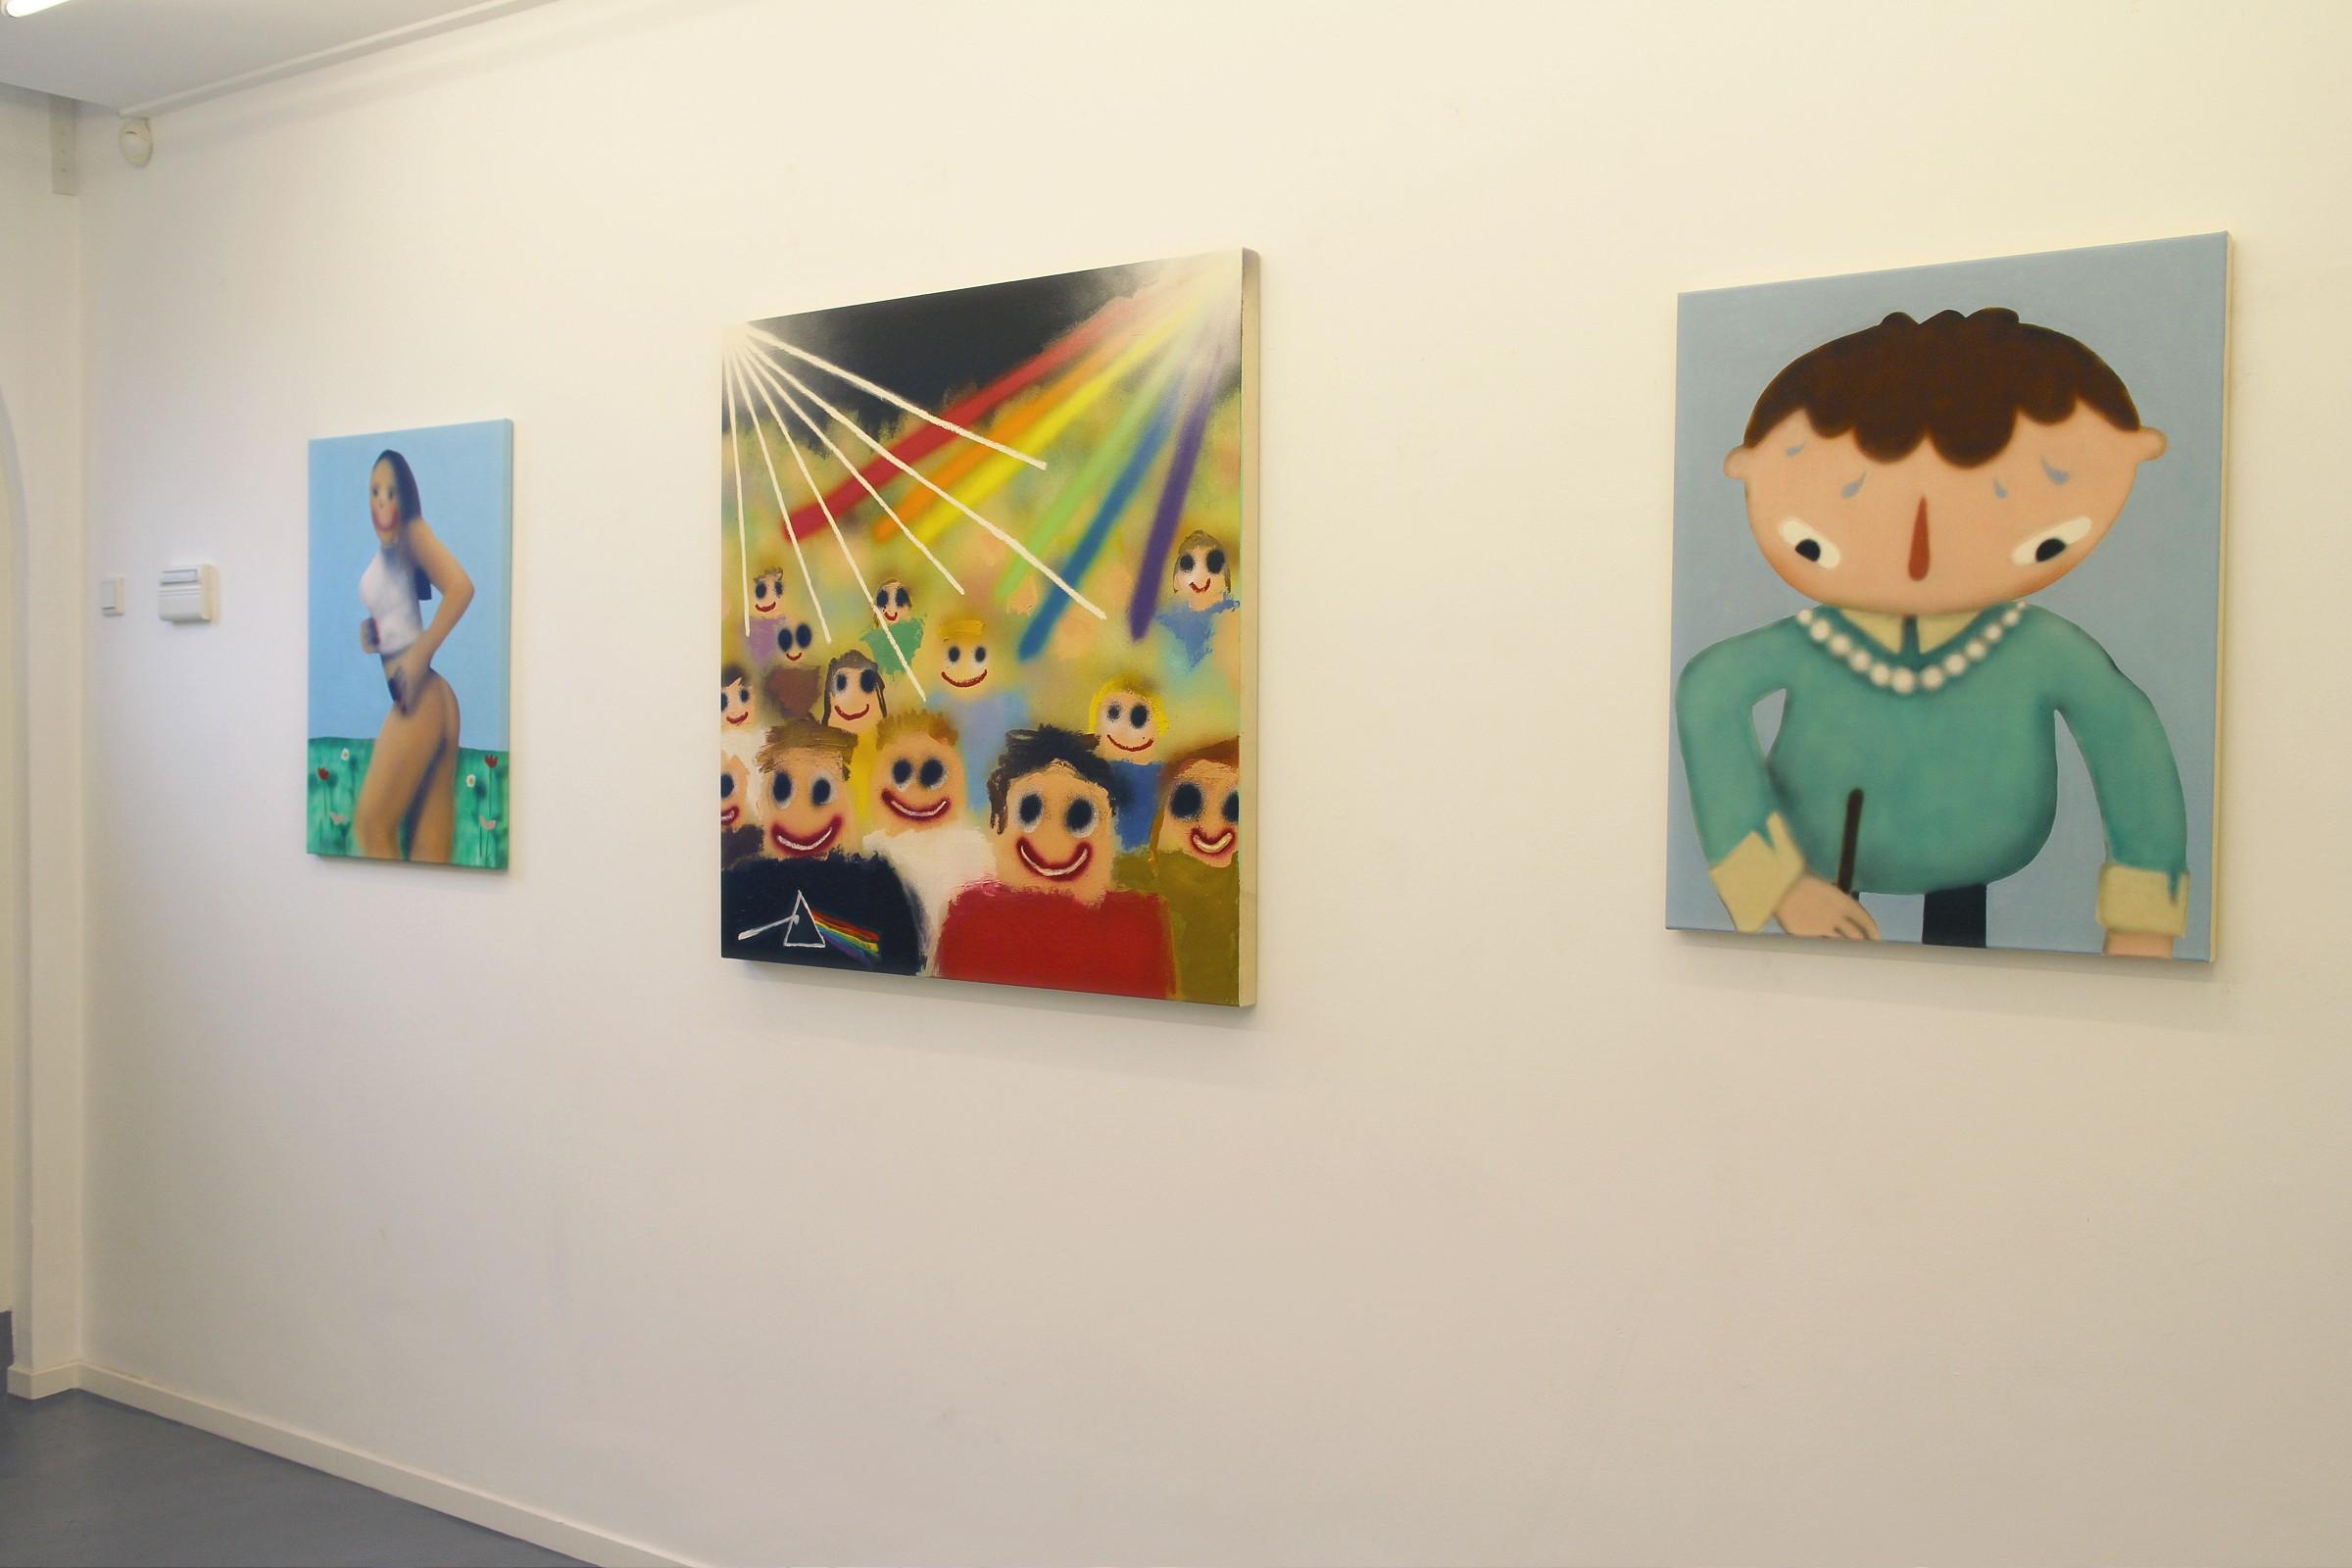 """DontGiveADamns"" na galeria Marian Cramer Projects Artes & contextos dontgiveadamns37"